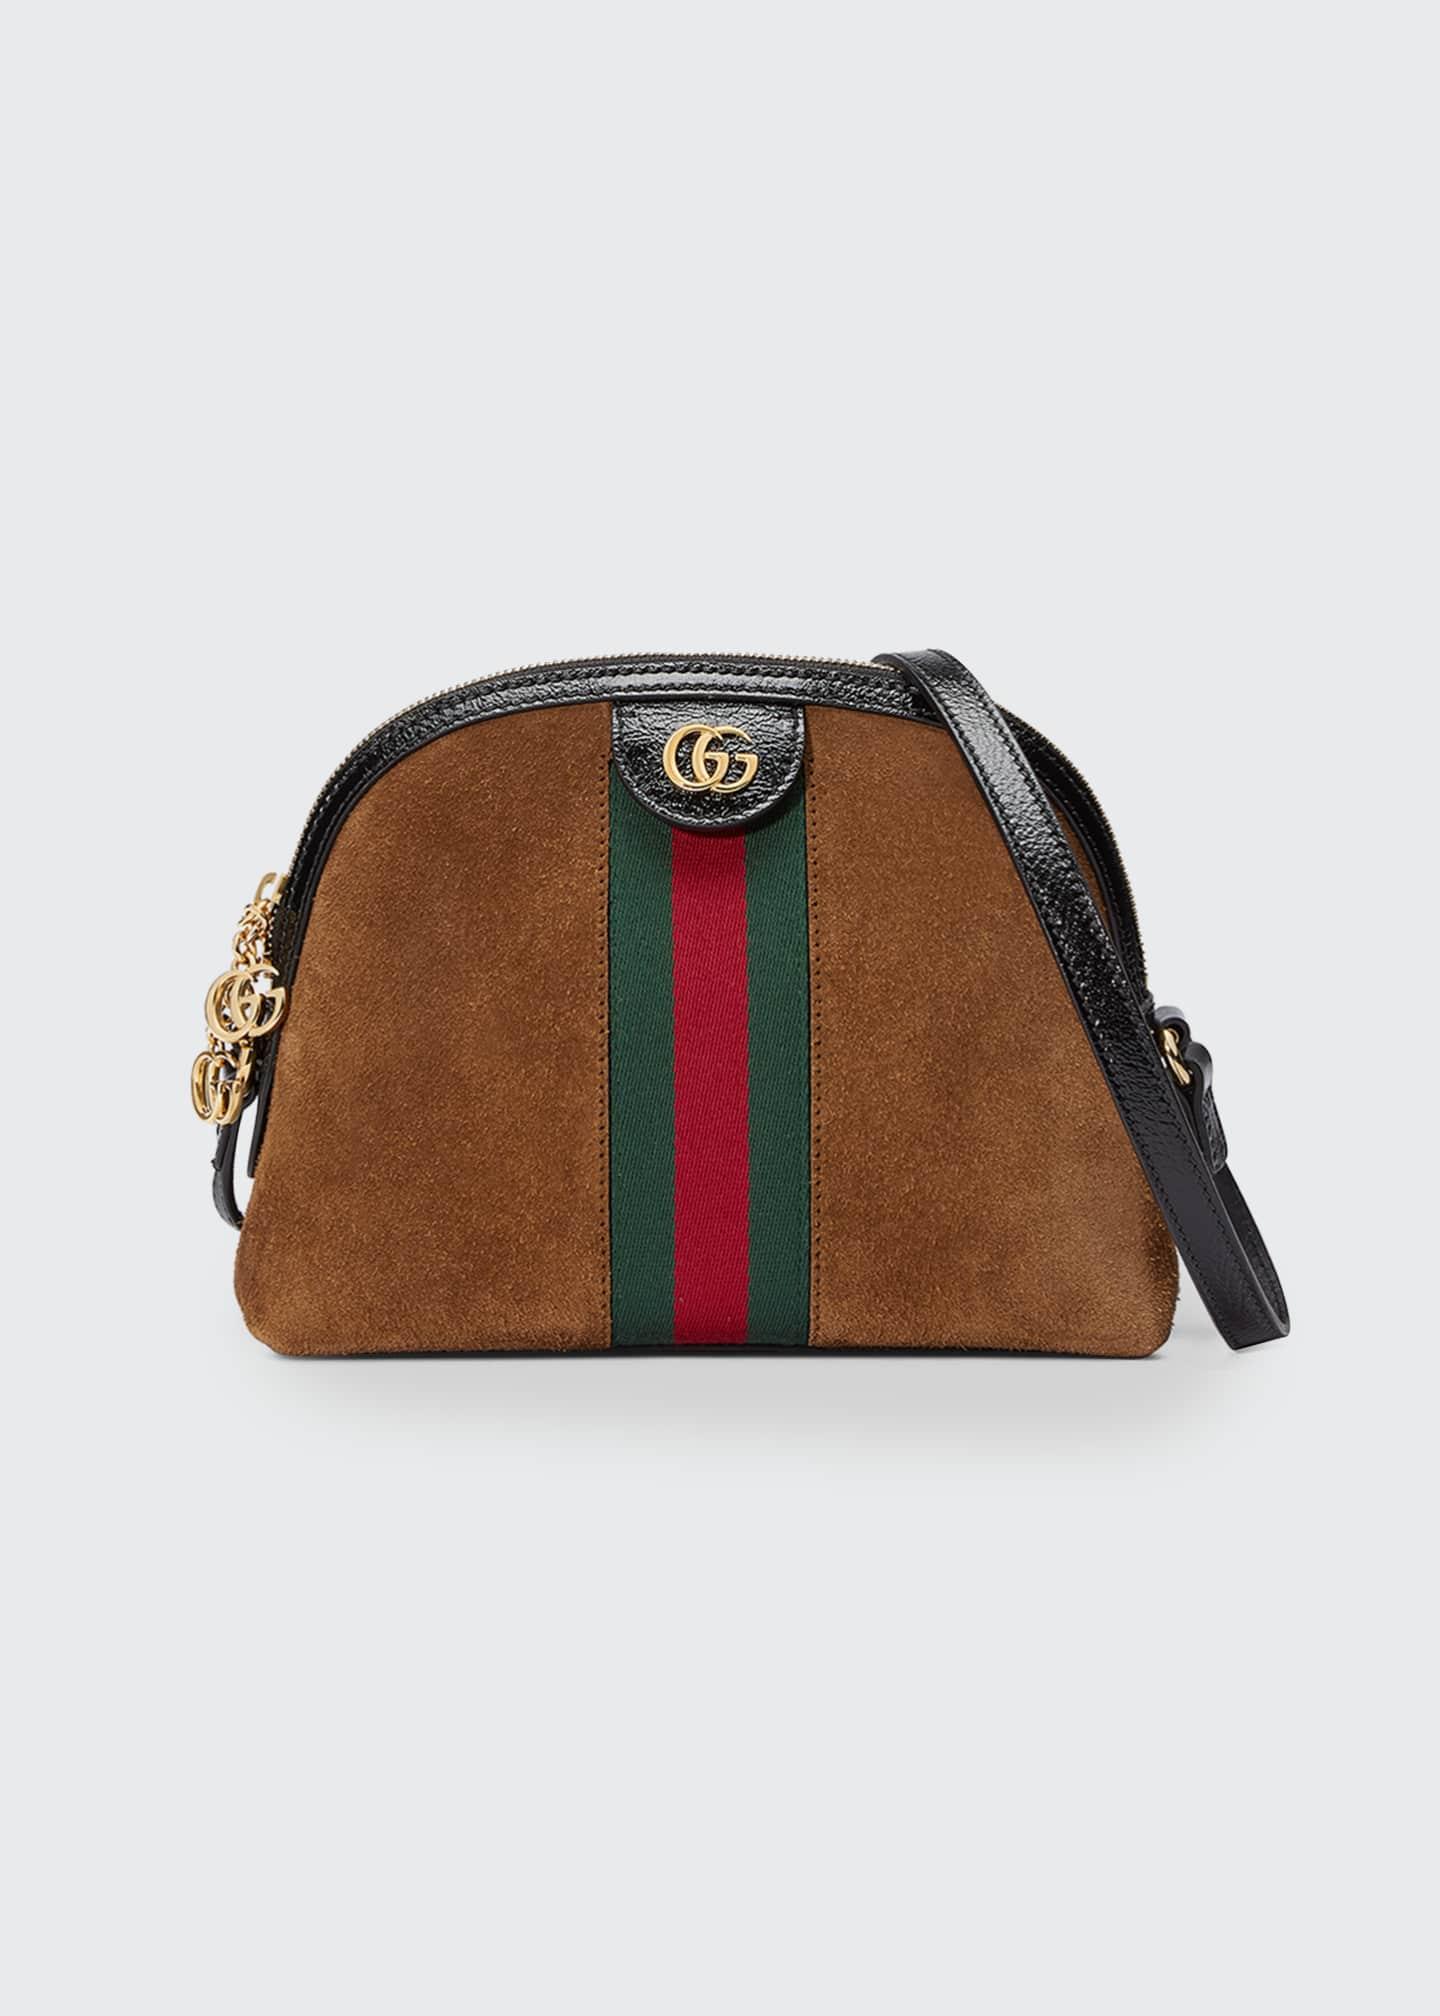 Gucci Linea Dragoni Suede Small Chain Shoulder Bag